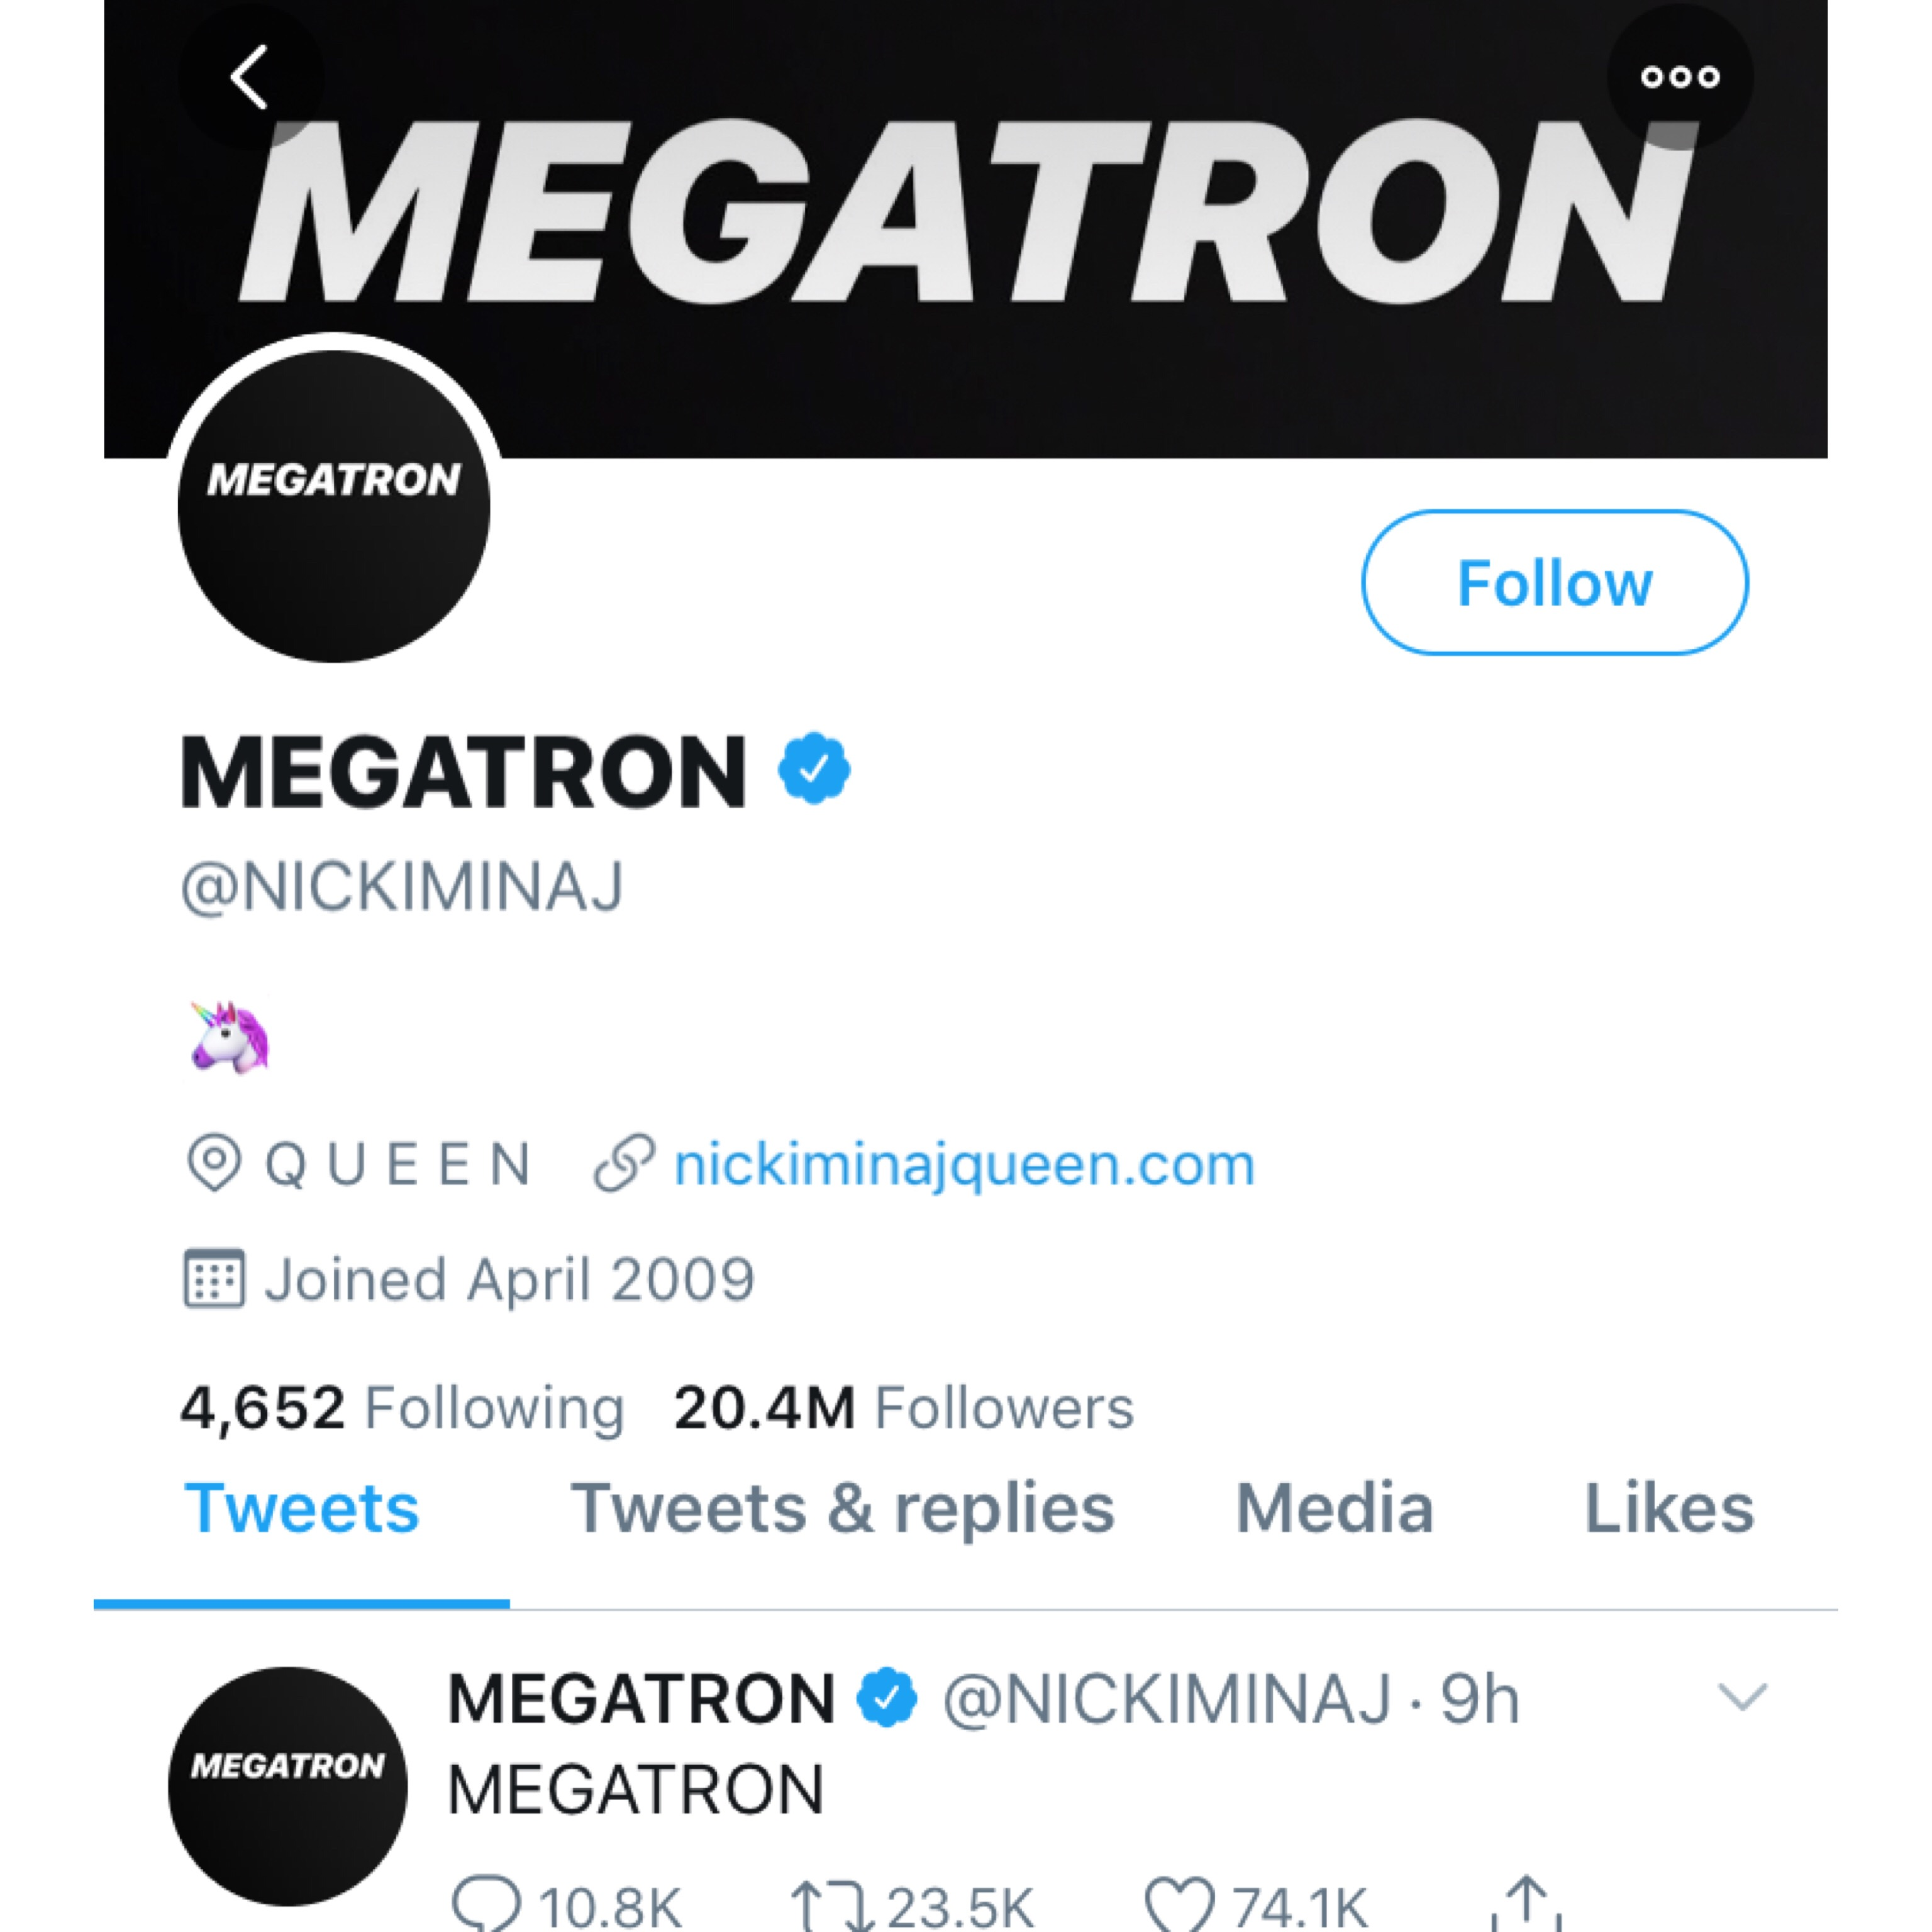 The Barbz Are Trying To Decode Nicki Minaj's Cryptic 'Megatron' Posts